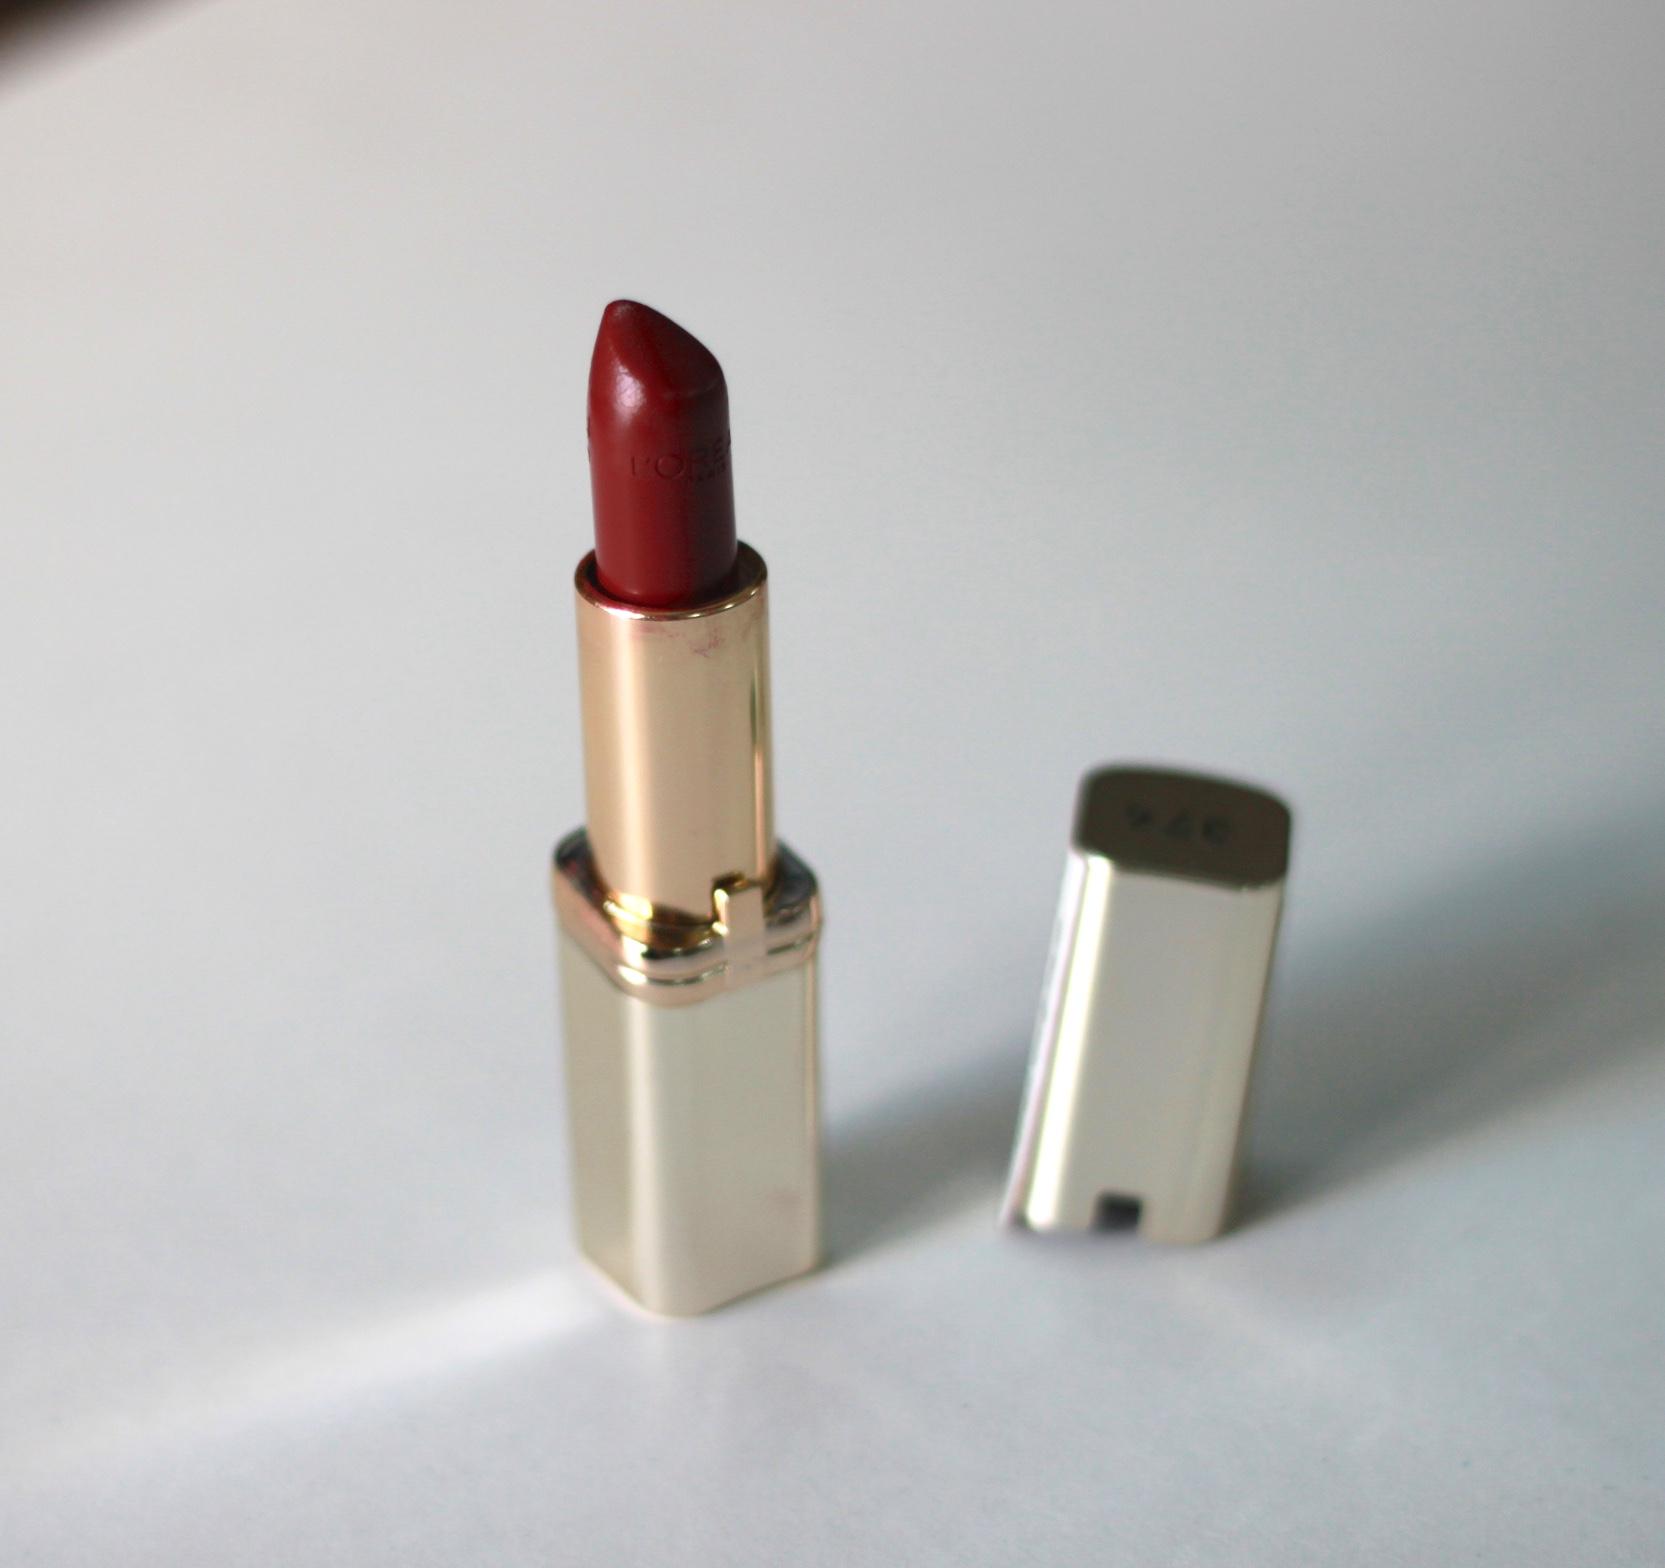 top 5 winter lipsticks, winter lipsticks, MAC ruby woo, maybelline velvet mat, fleur de force, mac soar, kat von d, loreal color riche intense plum